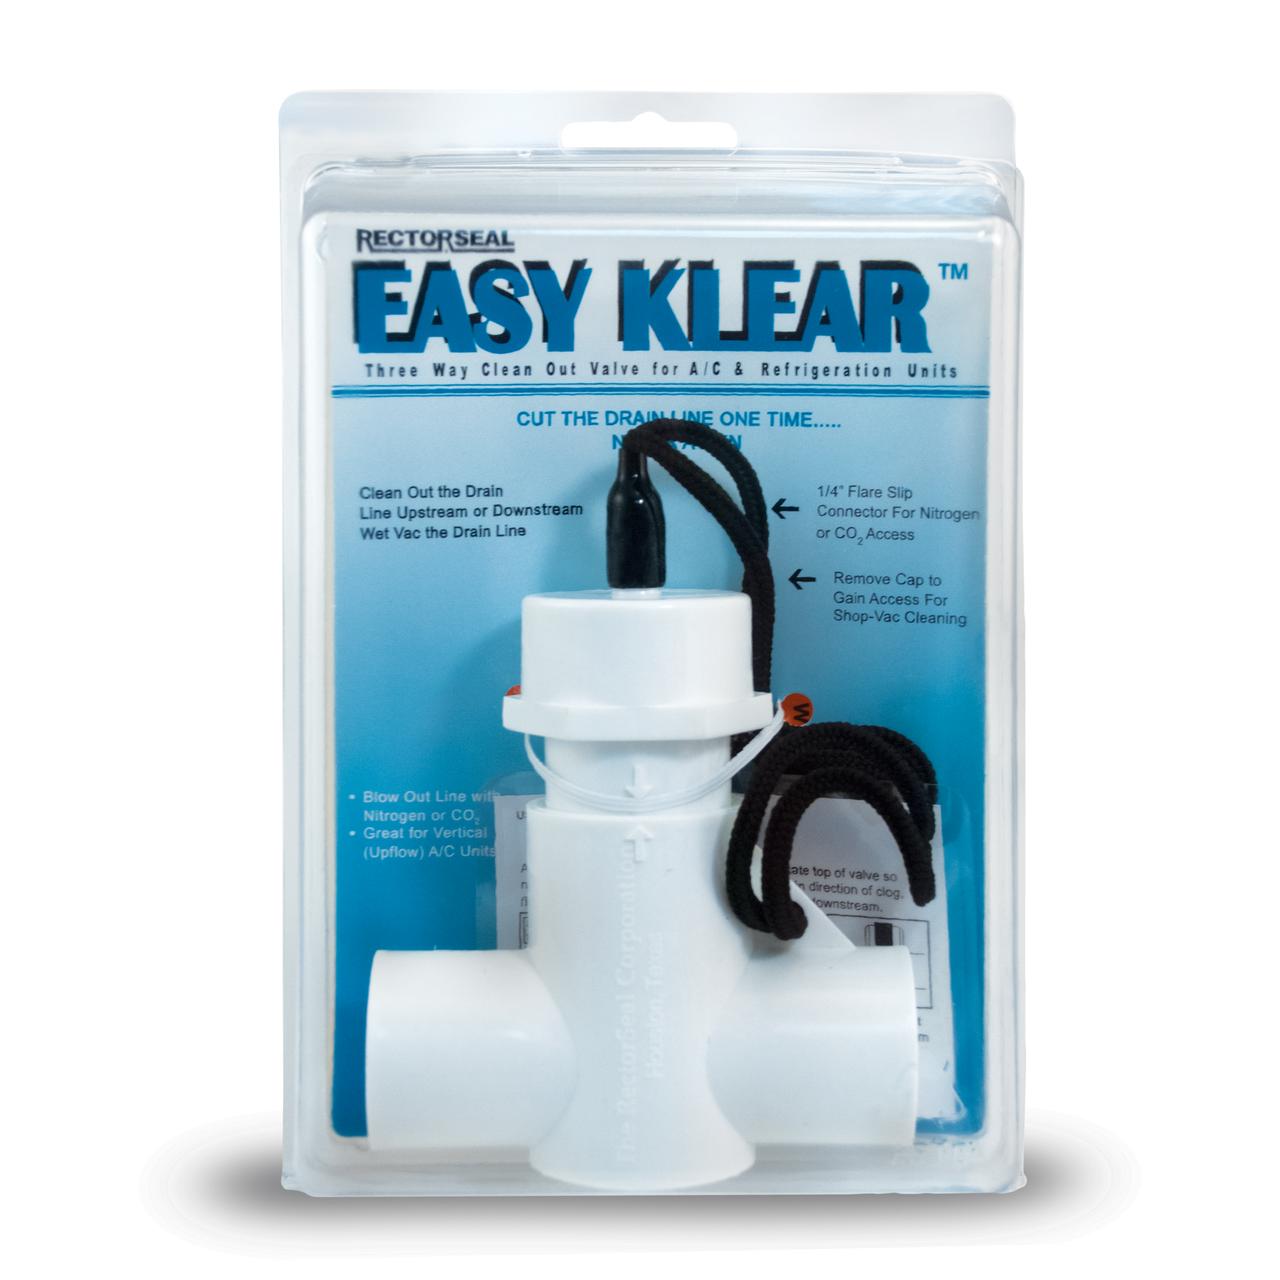 Easy Klear™